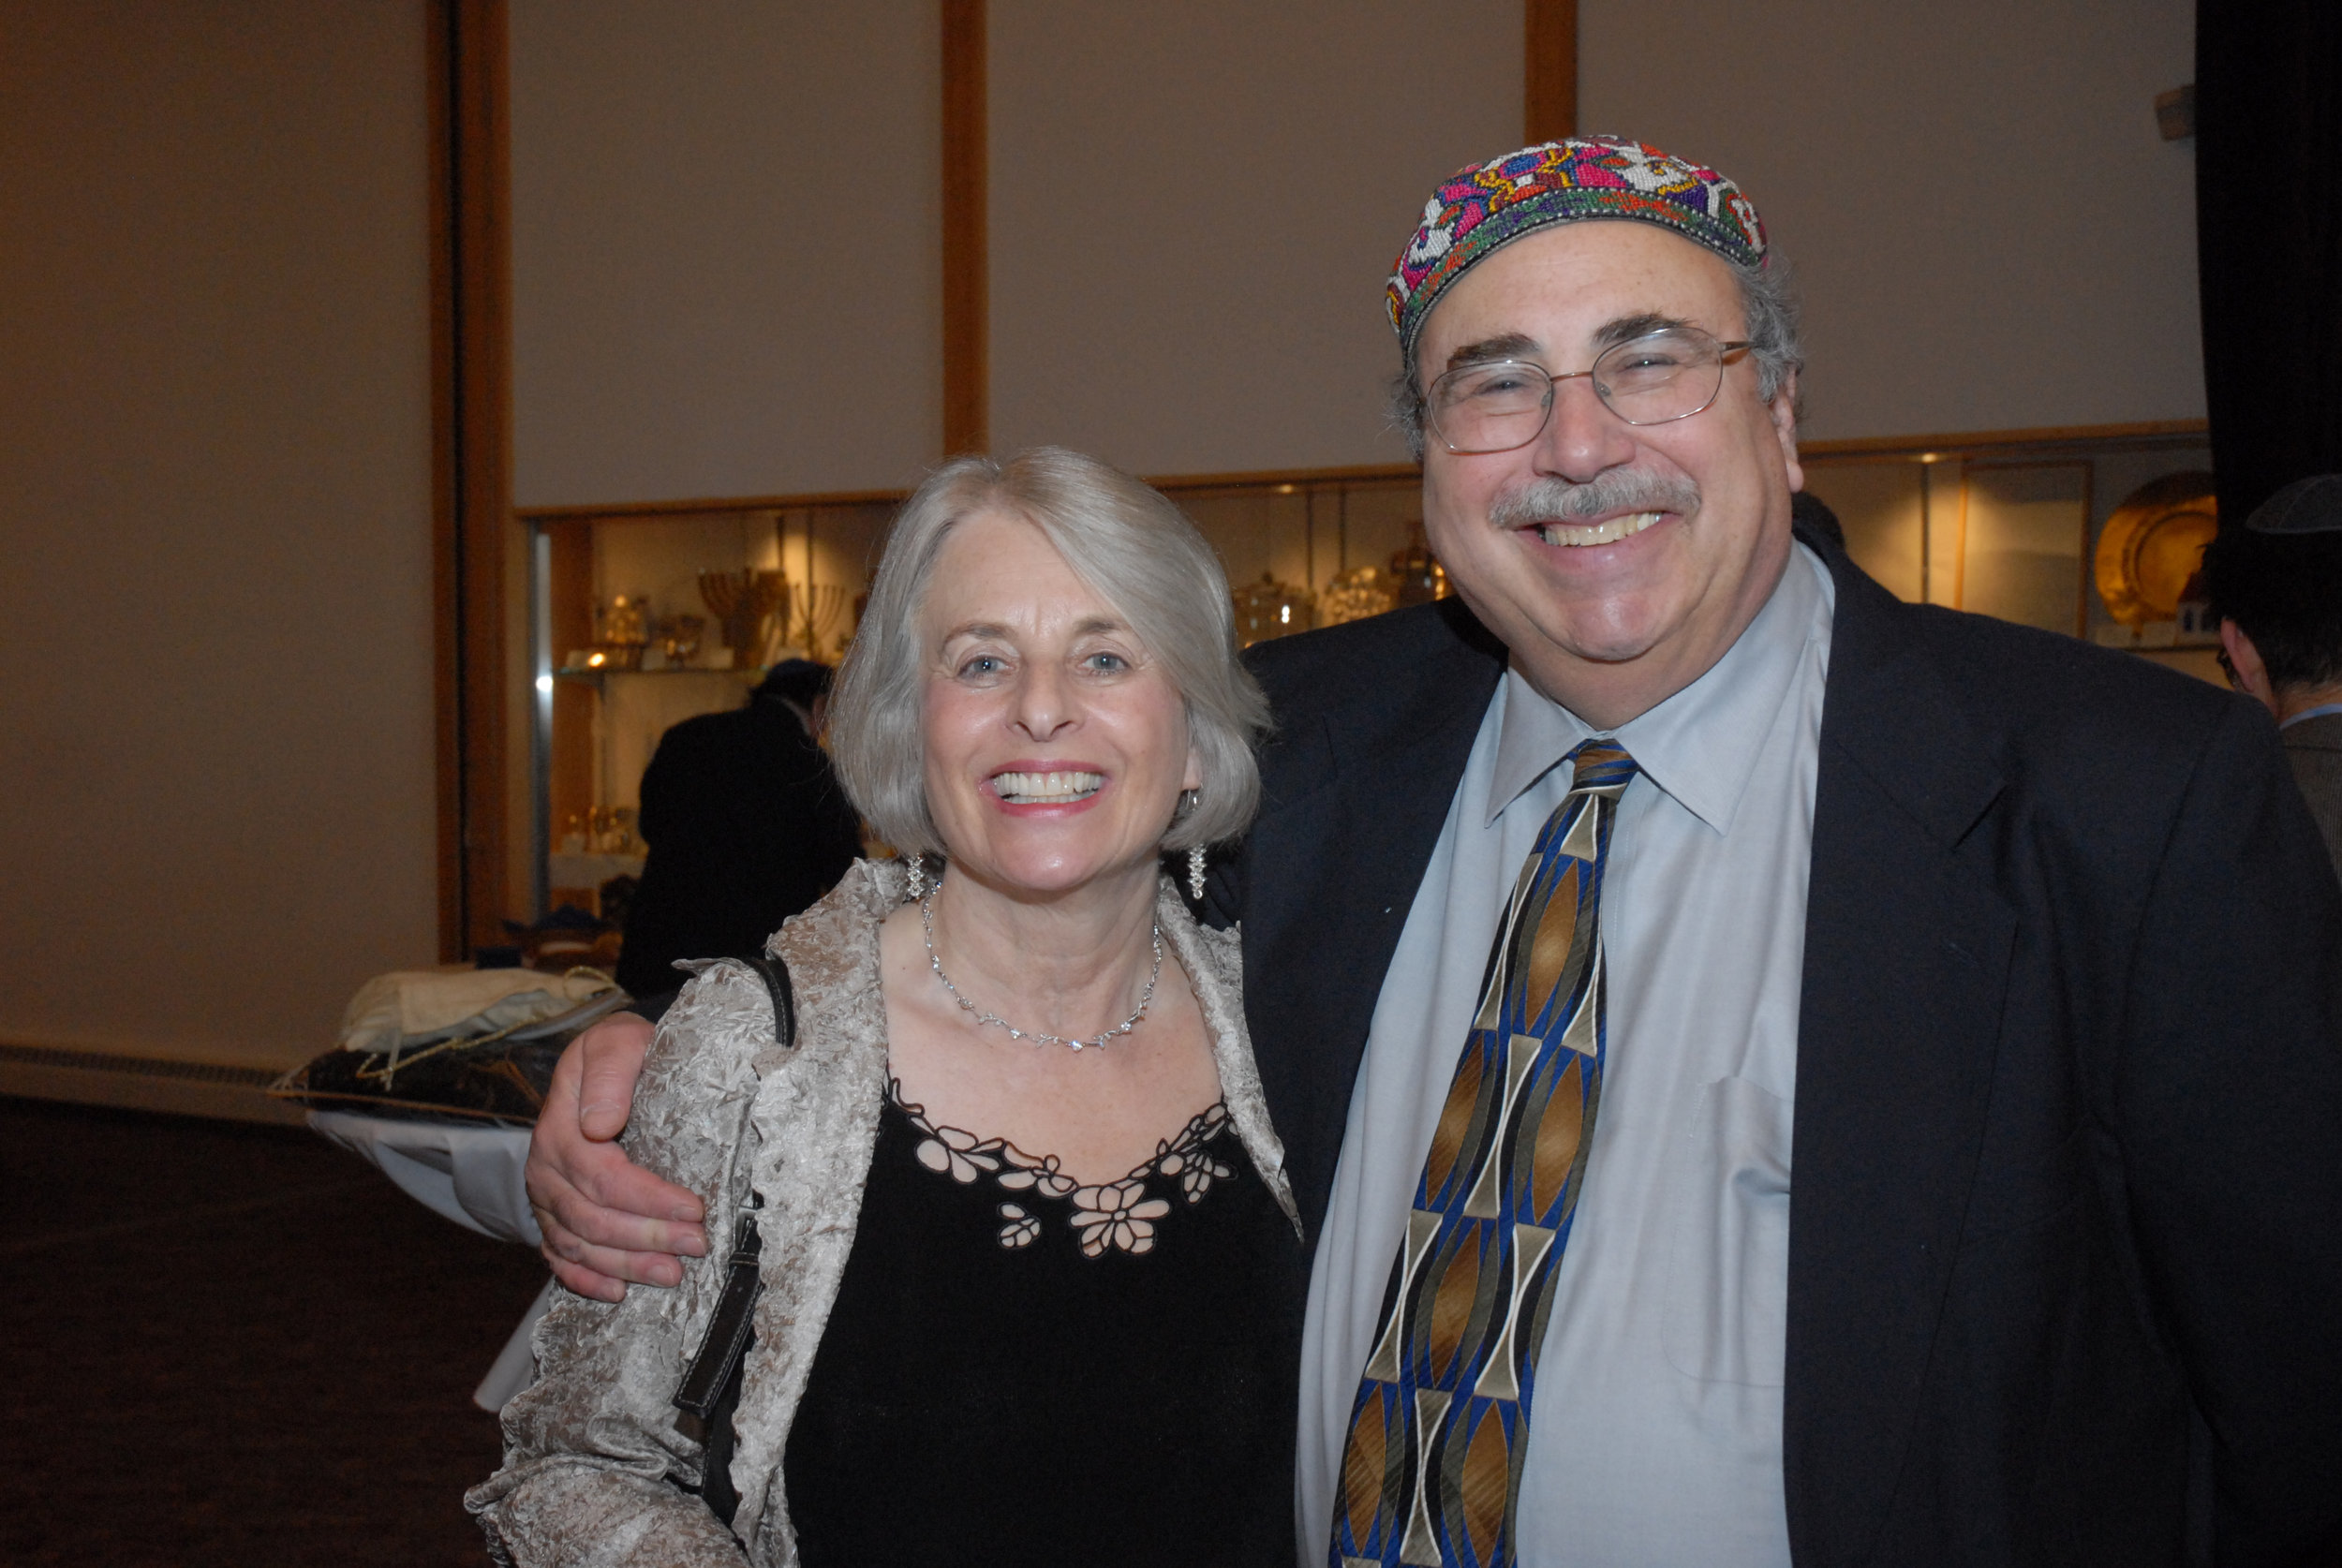 David and loving wife, Celia